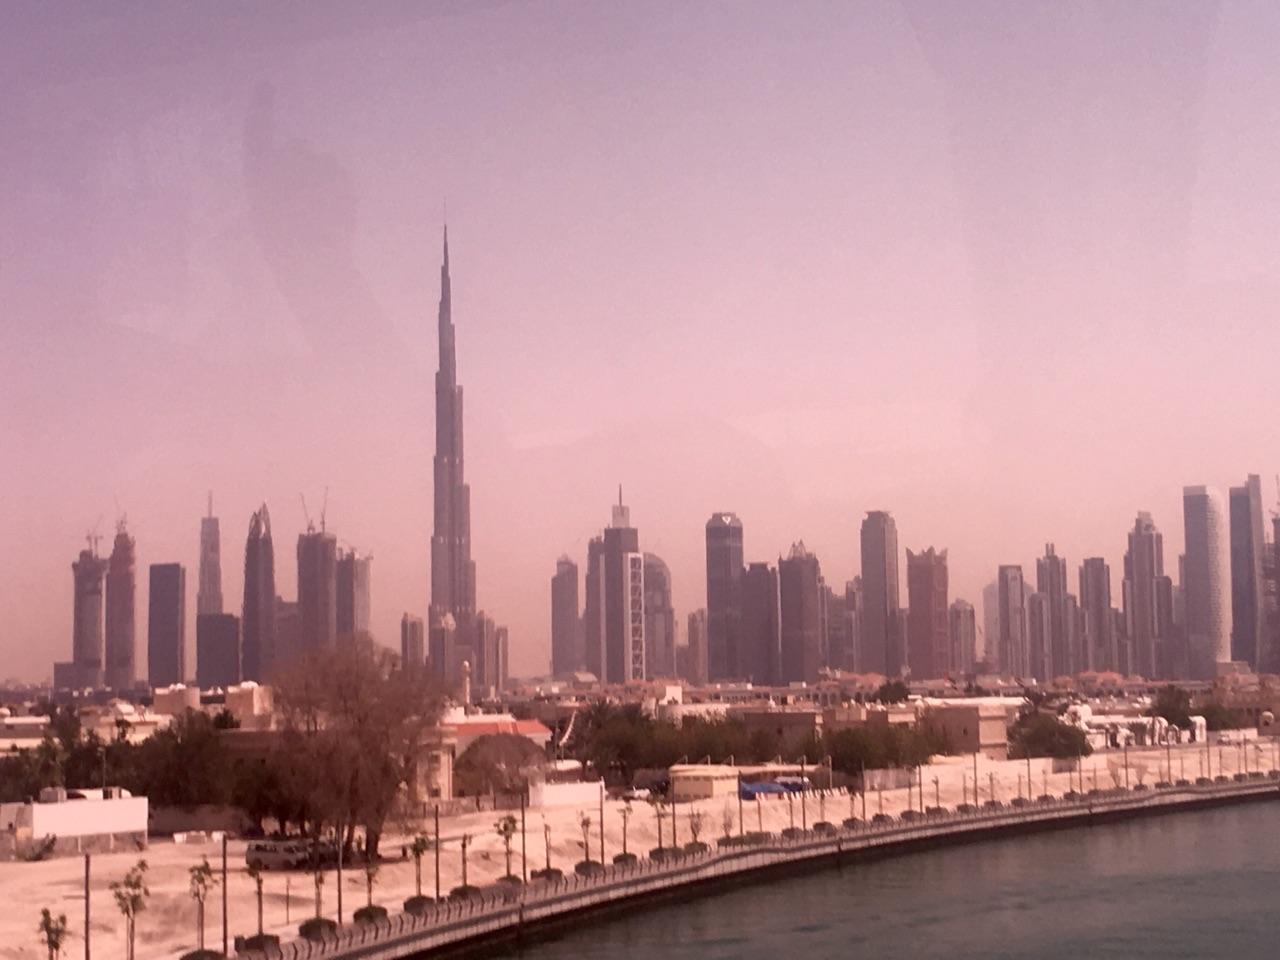 Dubai skyline, tallest building